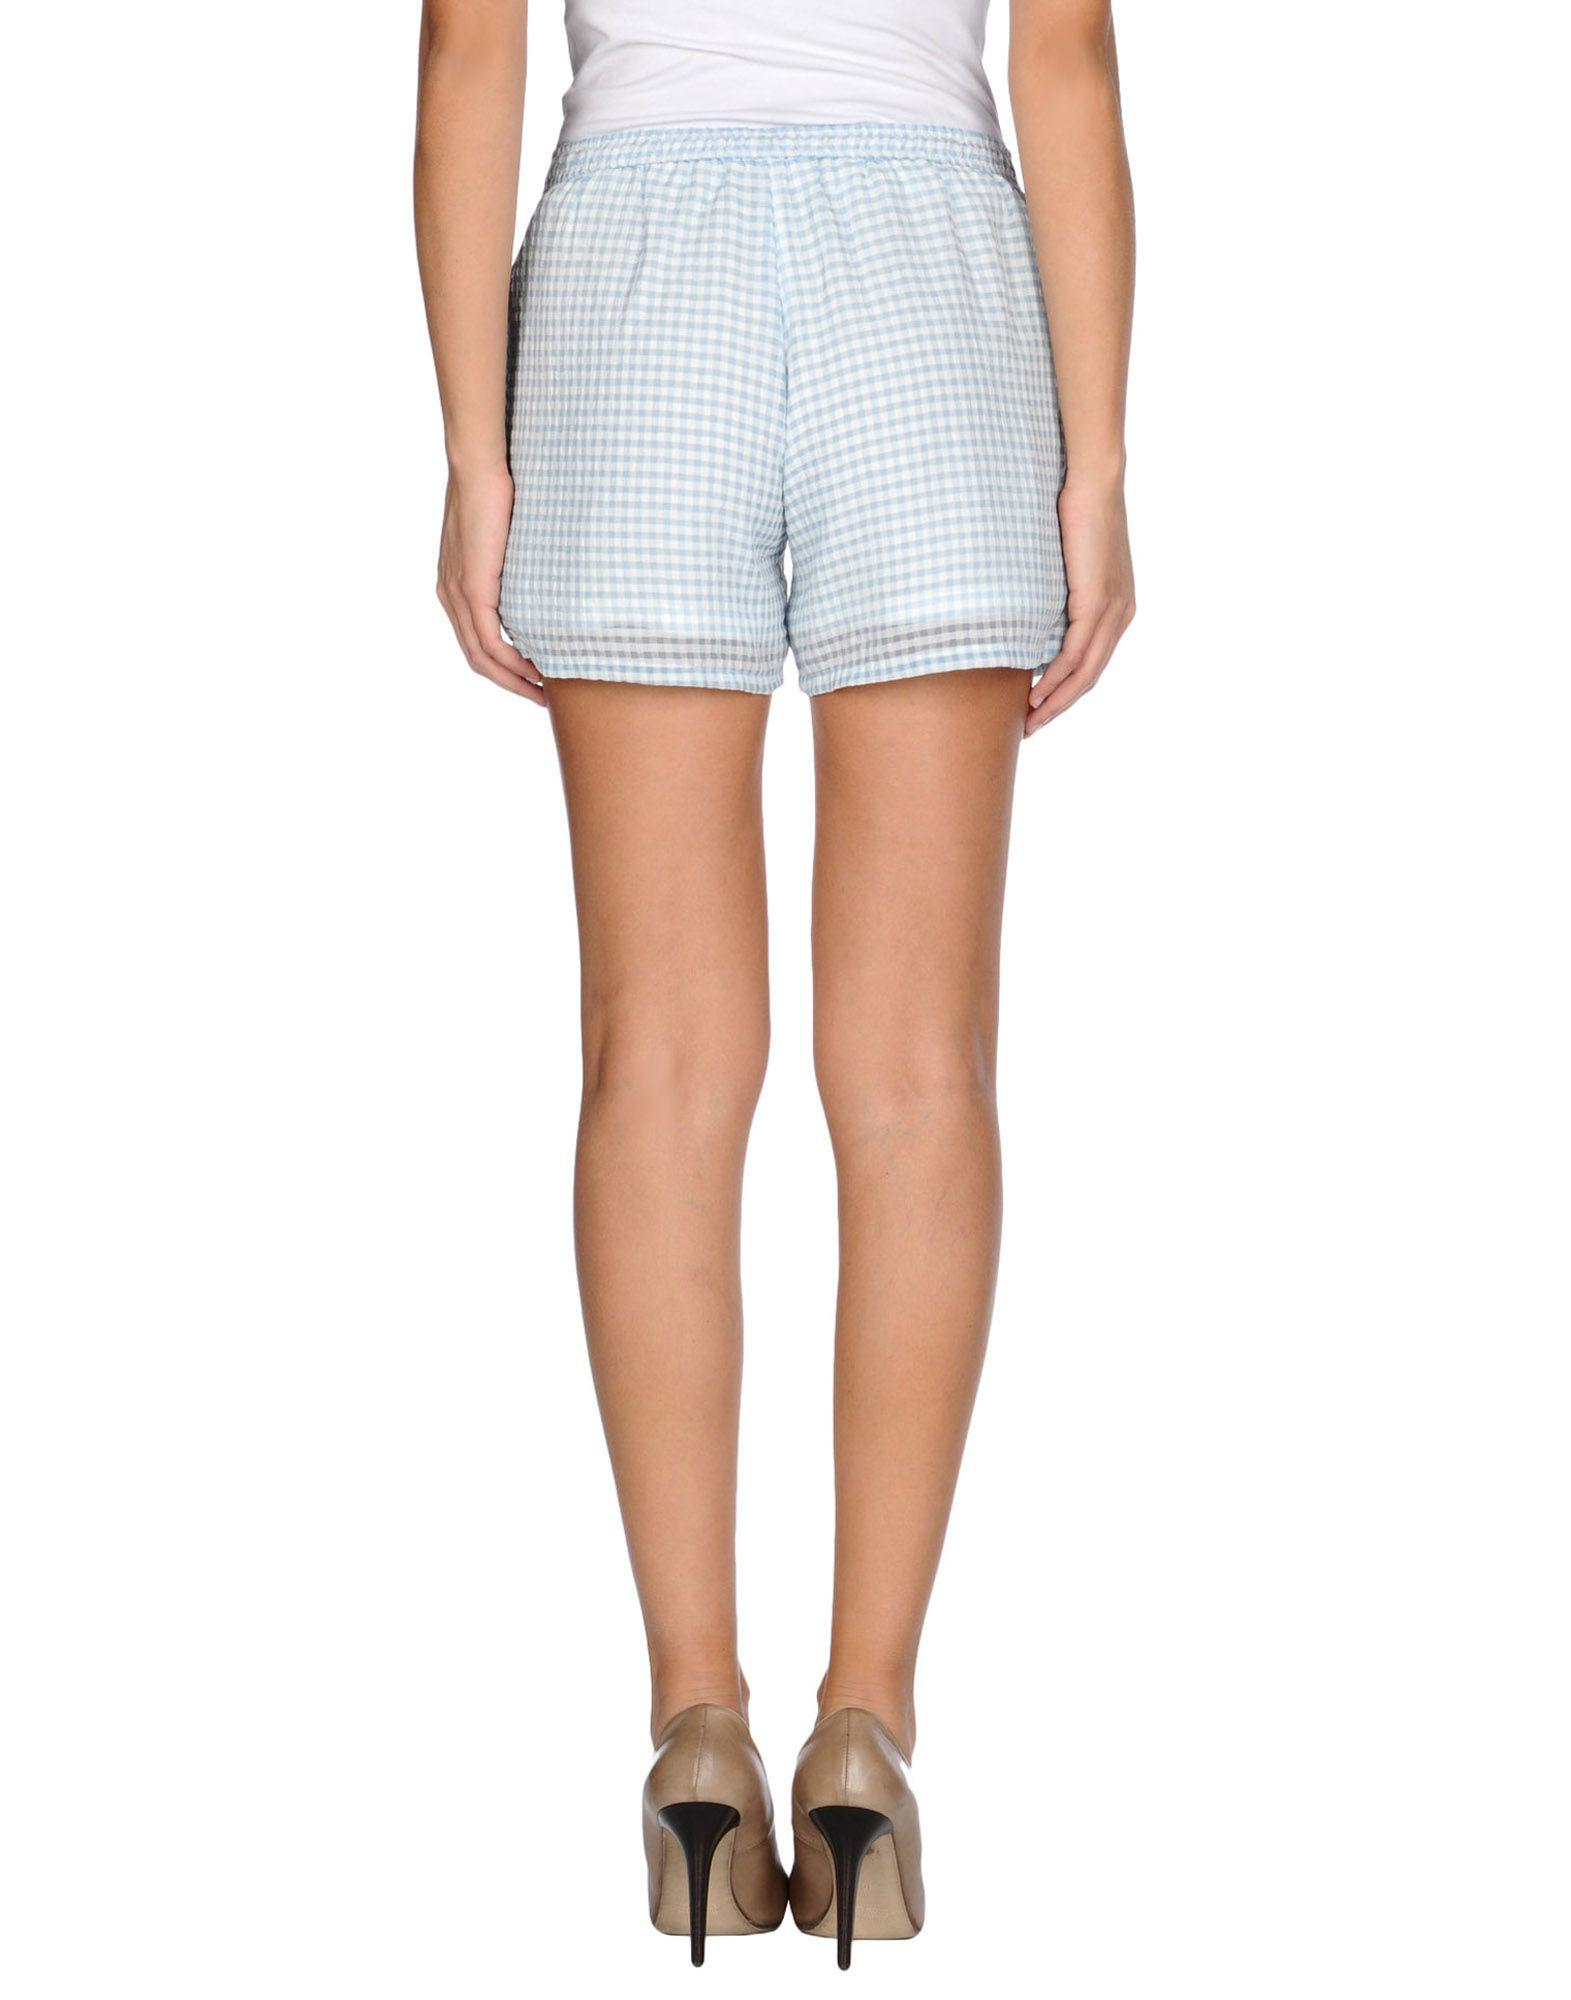 DENIM - Denim shorts Brigitte Bardot mlpJCp6u